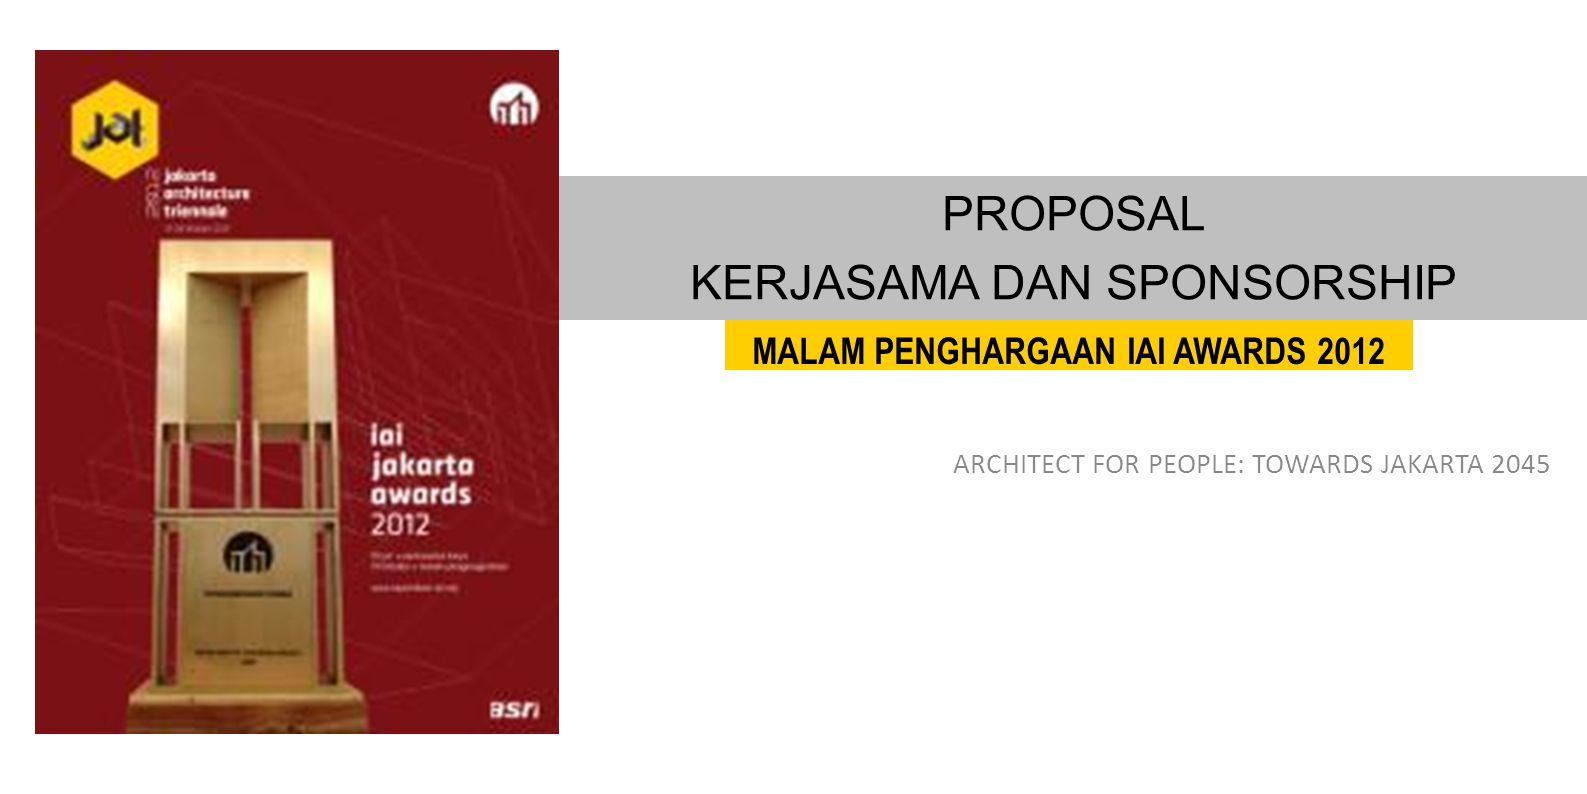 ARCHITECT FOR PEOPLE: TOWARDS JAKARTA 2045 PROPOSAL KERJASAMA DAN SPONSORSHIP MALAM PENGHARGAAN IAI AWARDS 2012